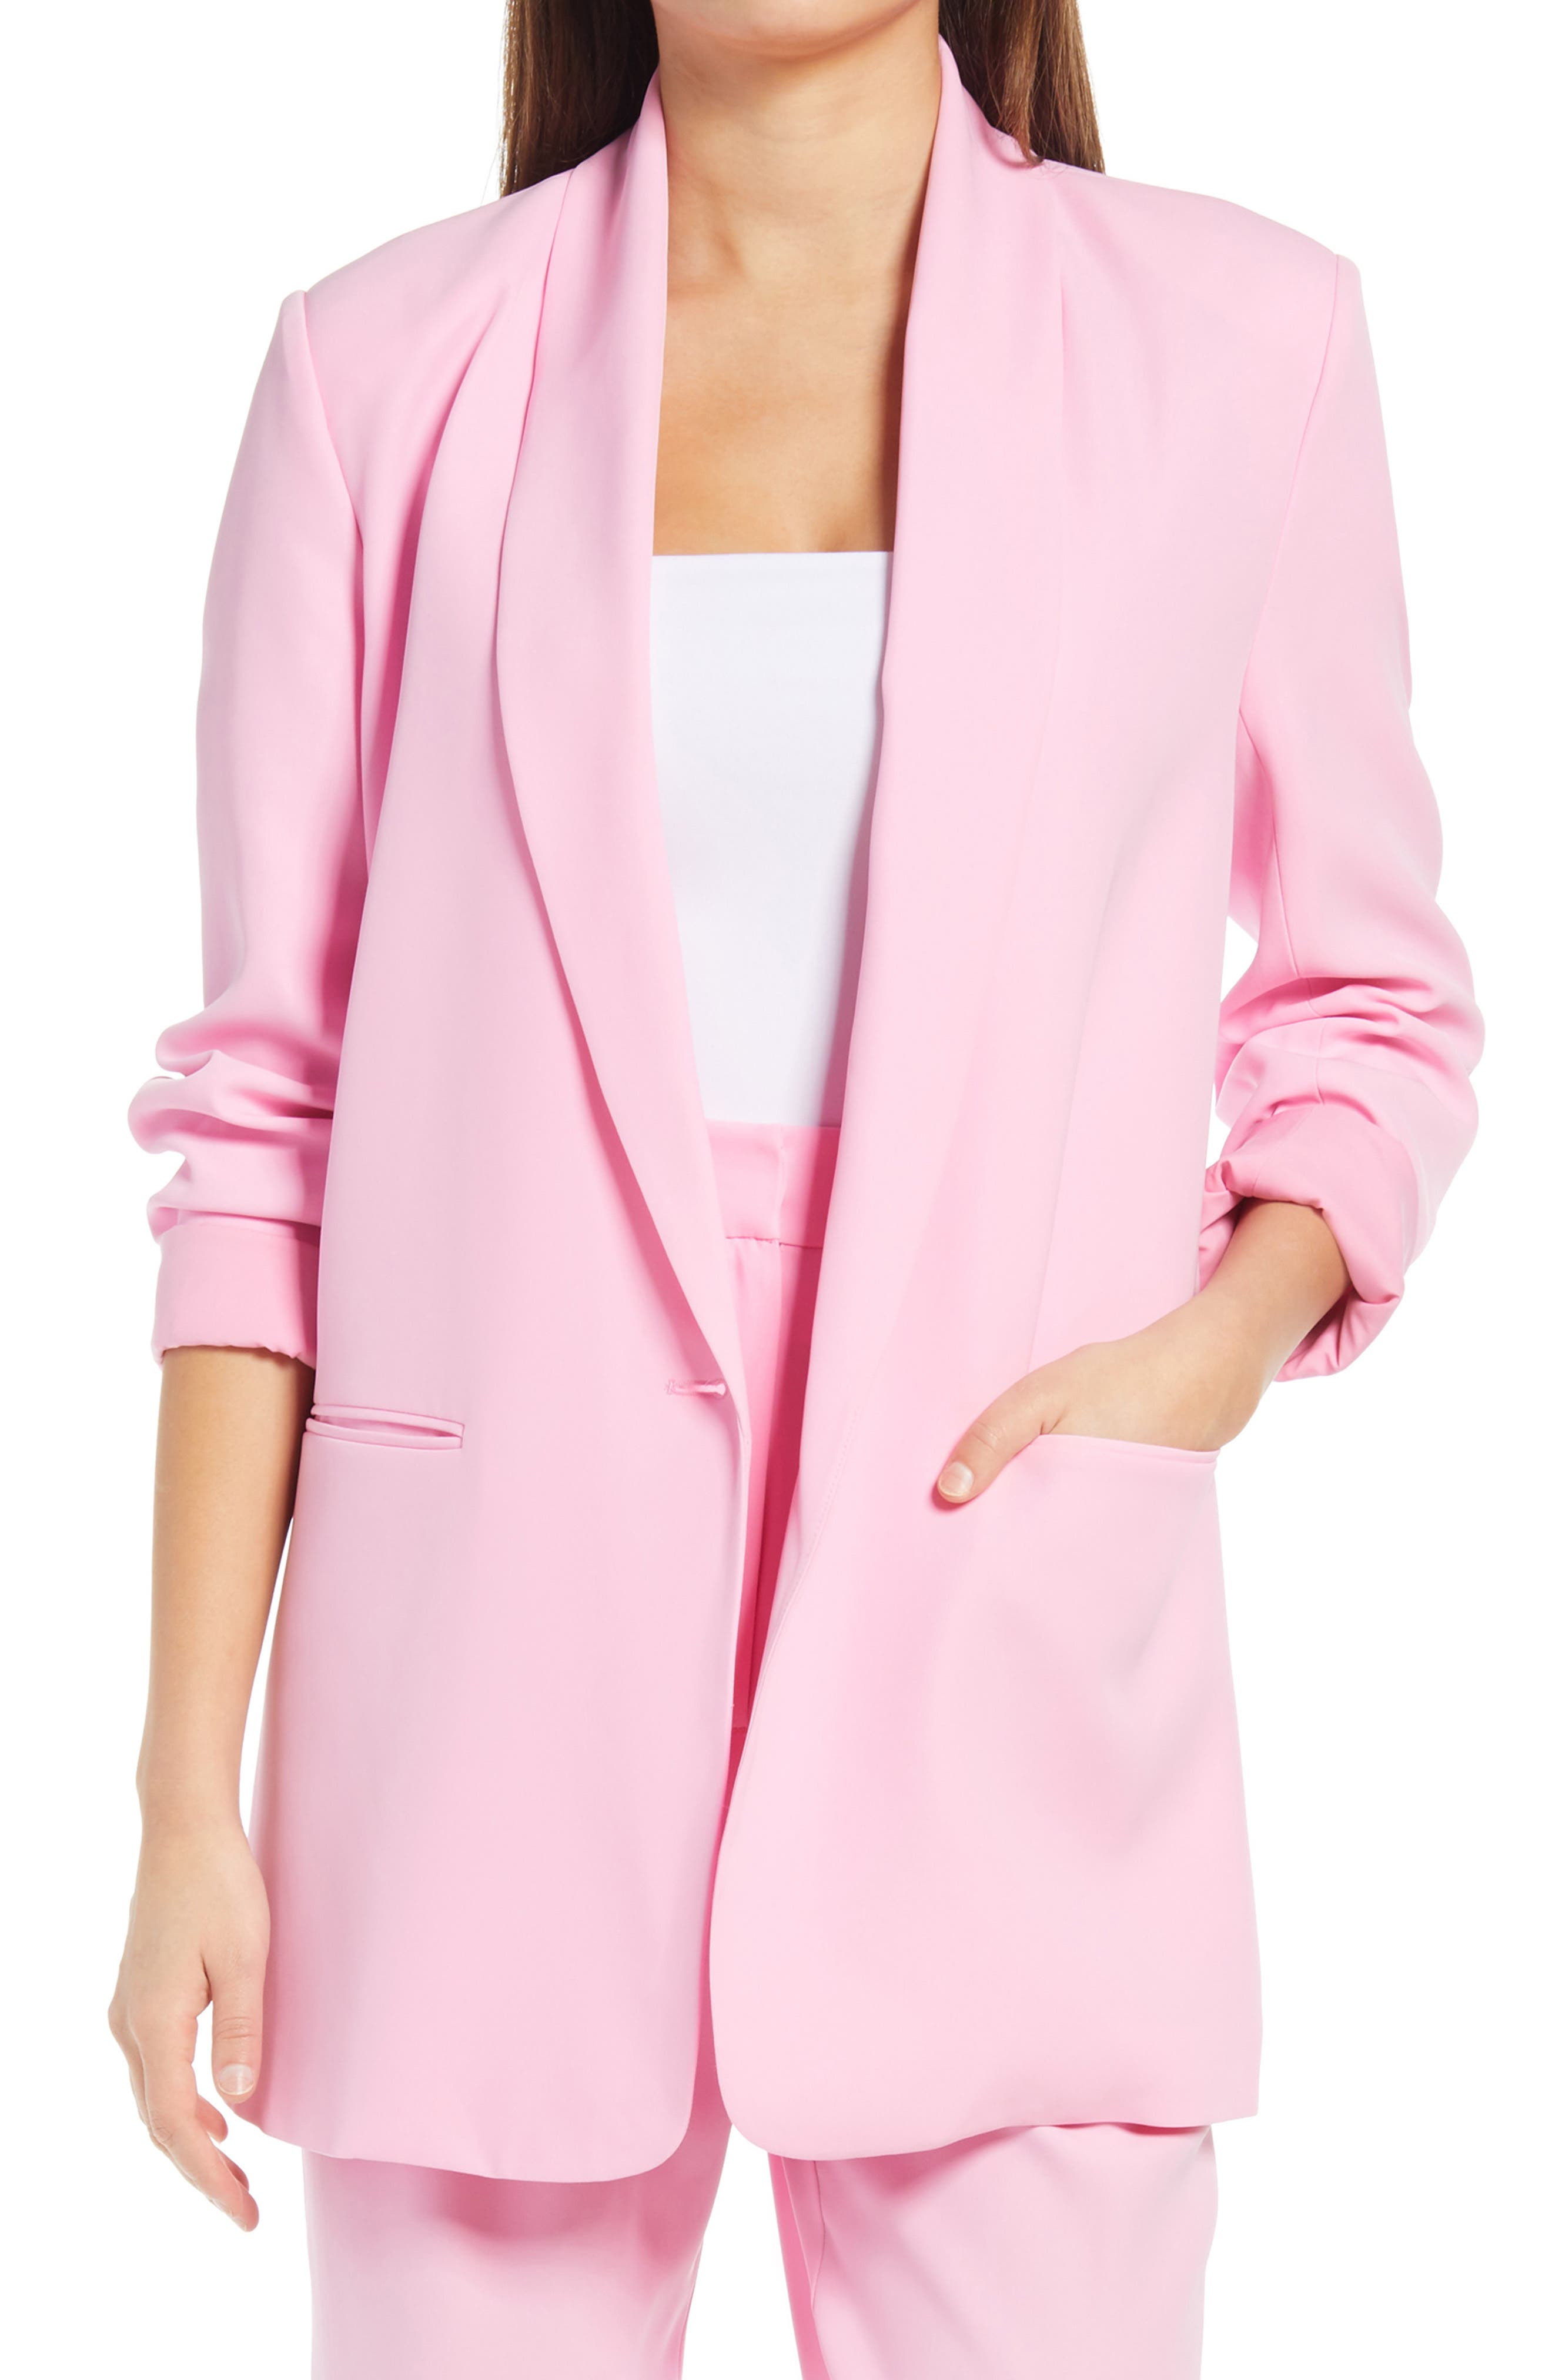 80s Windbreakers, Jackets, Coats Womens Wayf Jeanette Longline Blazer Size Medium - Pink $110.00 AT vintagedancer.com